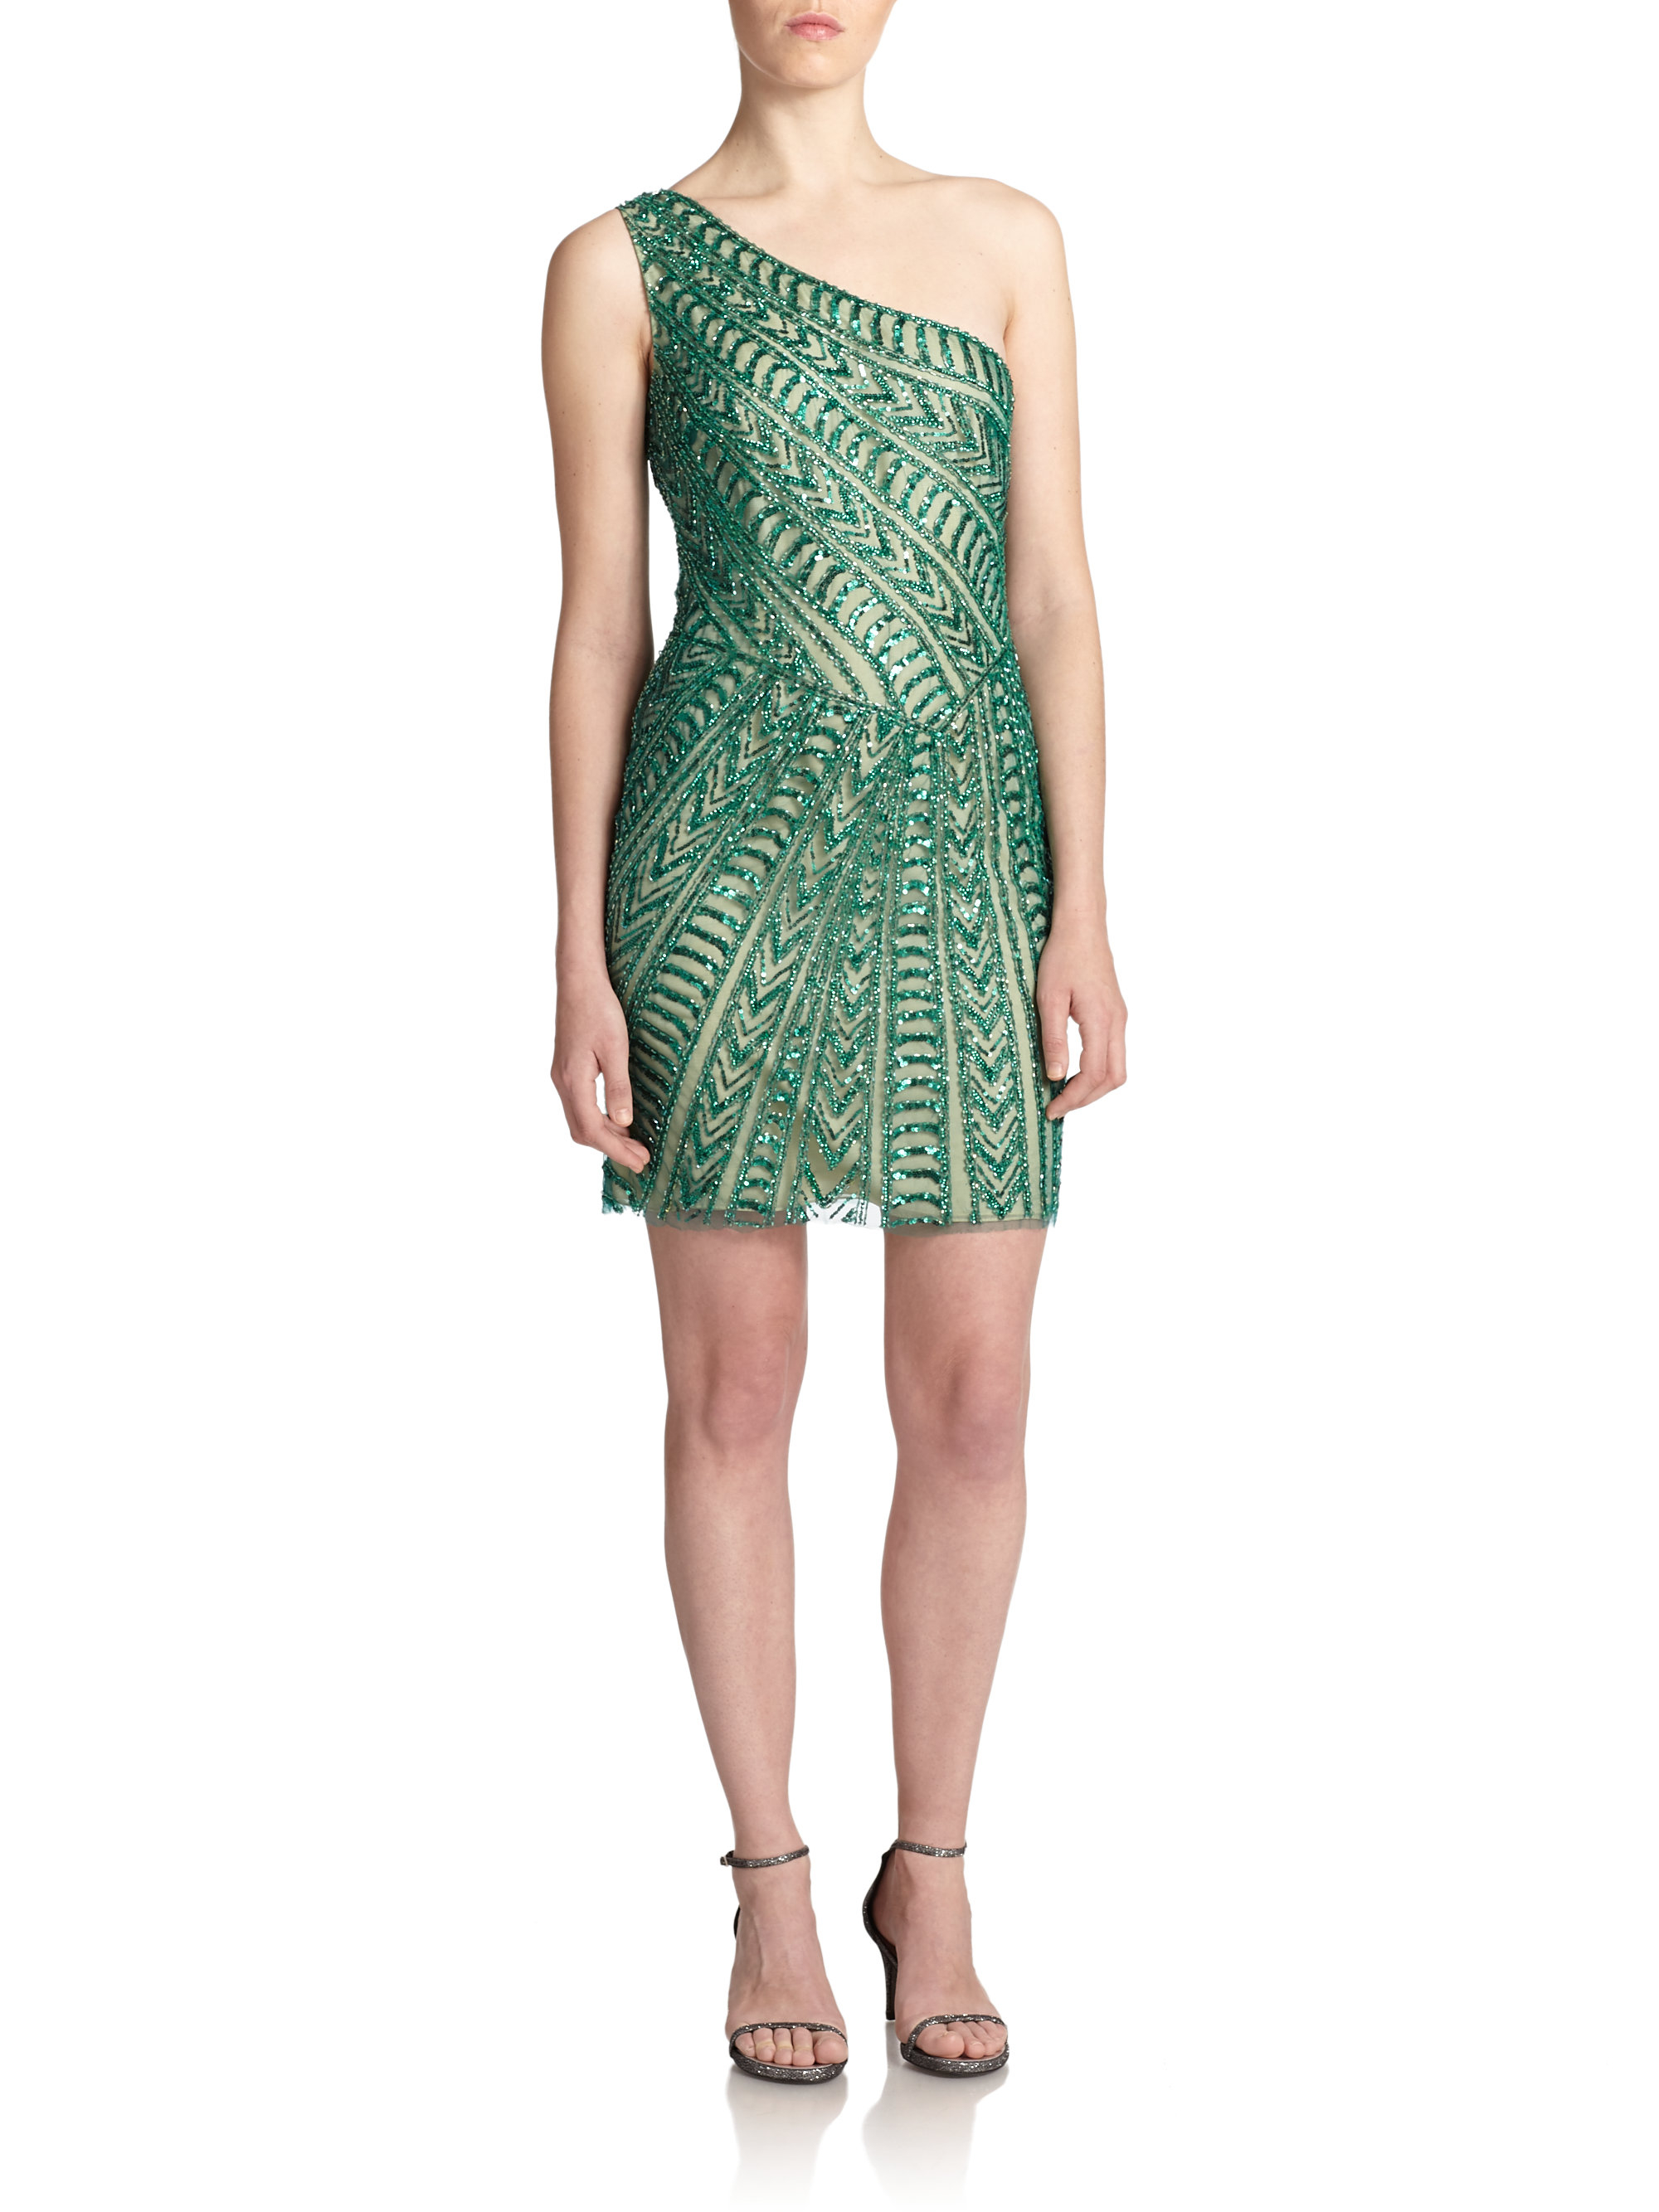 Green Sequin One Shoulder Dress